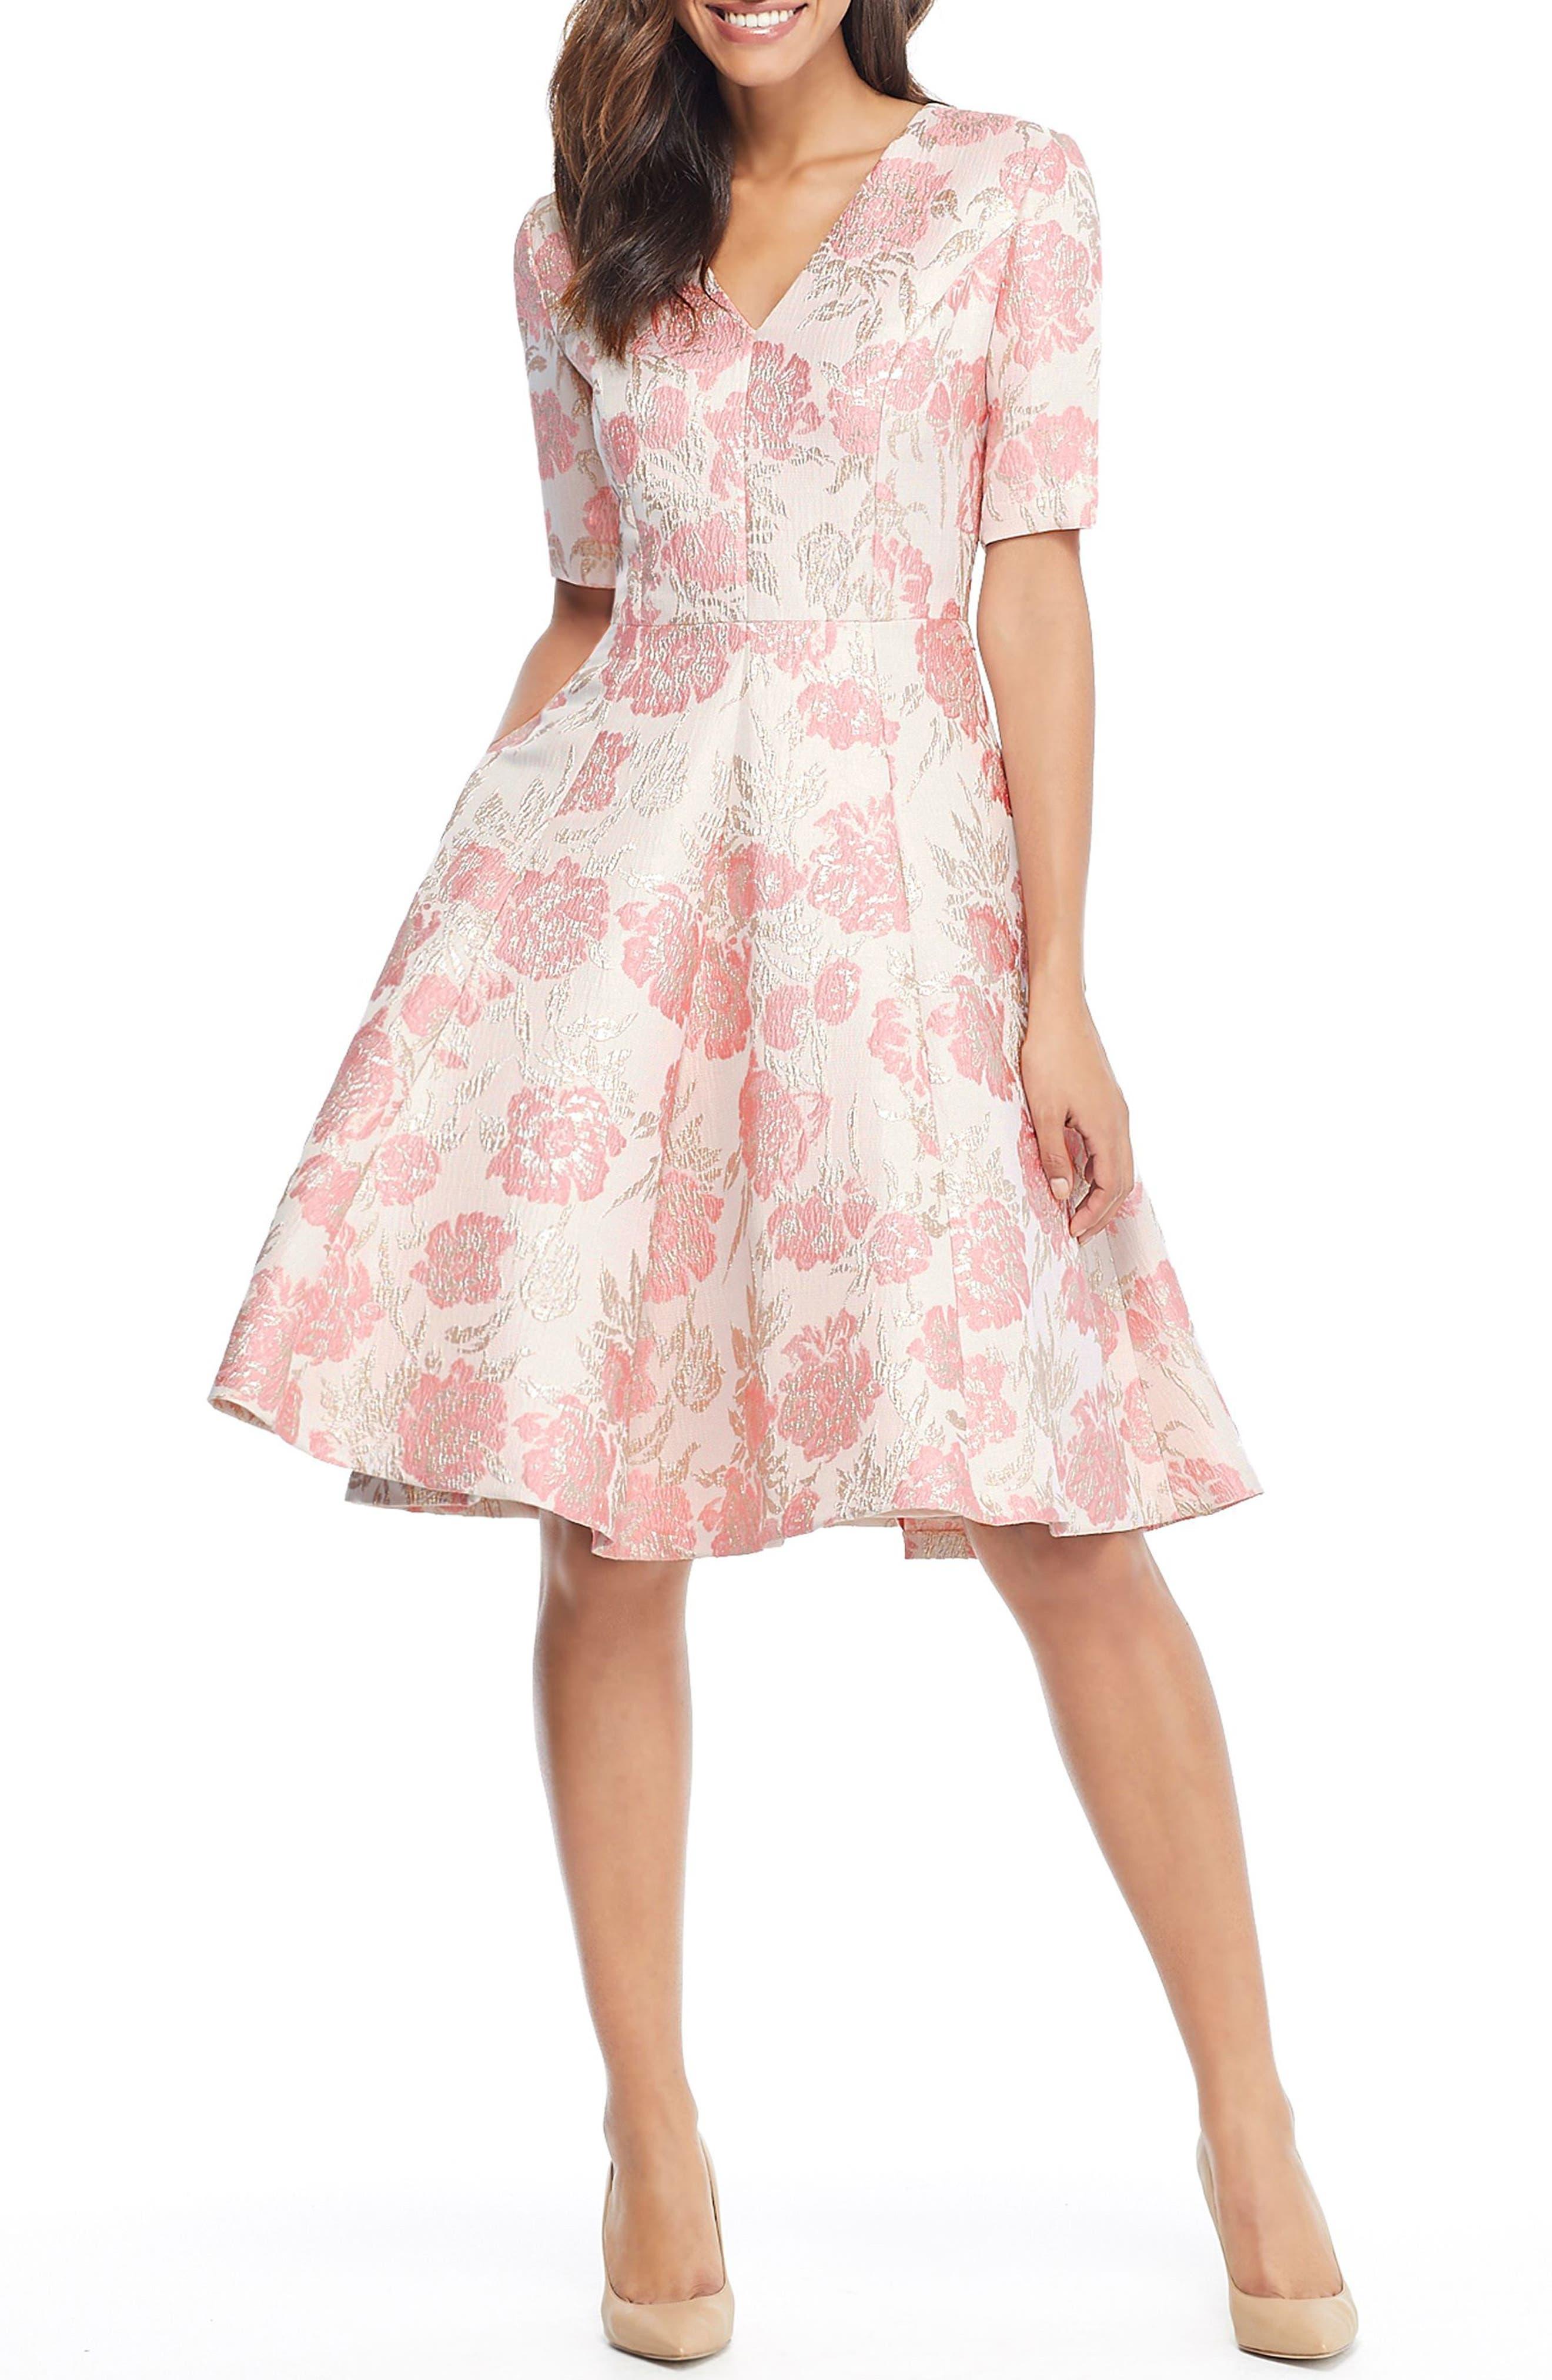 Adair Pink Passion Rose Jacquard Fit & Flare Dress,                             Main thumbnail 1, color,                             PINK PEARL